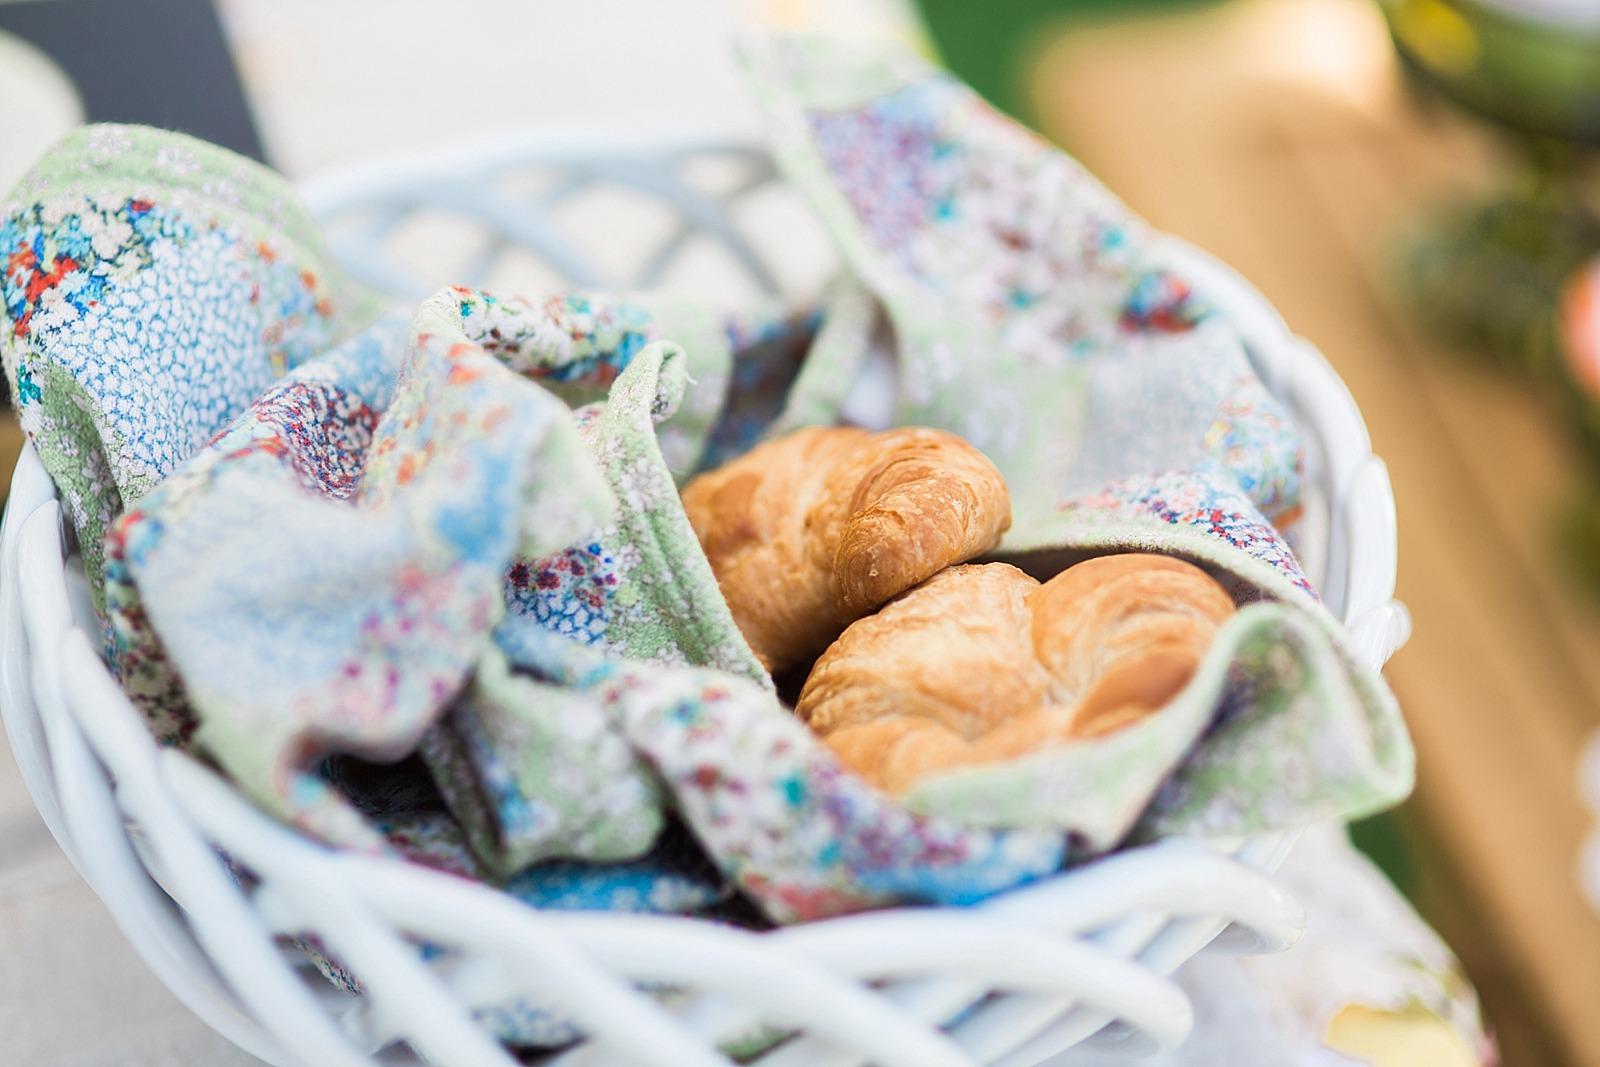 diana-elizabeth-blog-lifestyle-dunkin-creamers-dunkin-donuts-brunch-book-club--4535